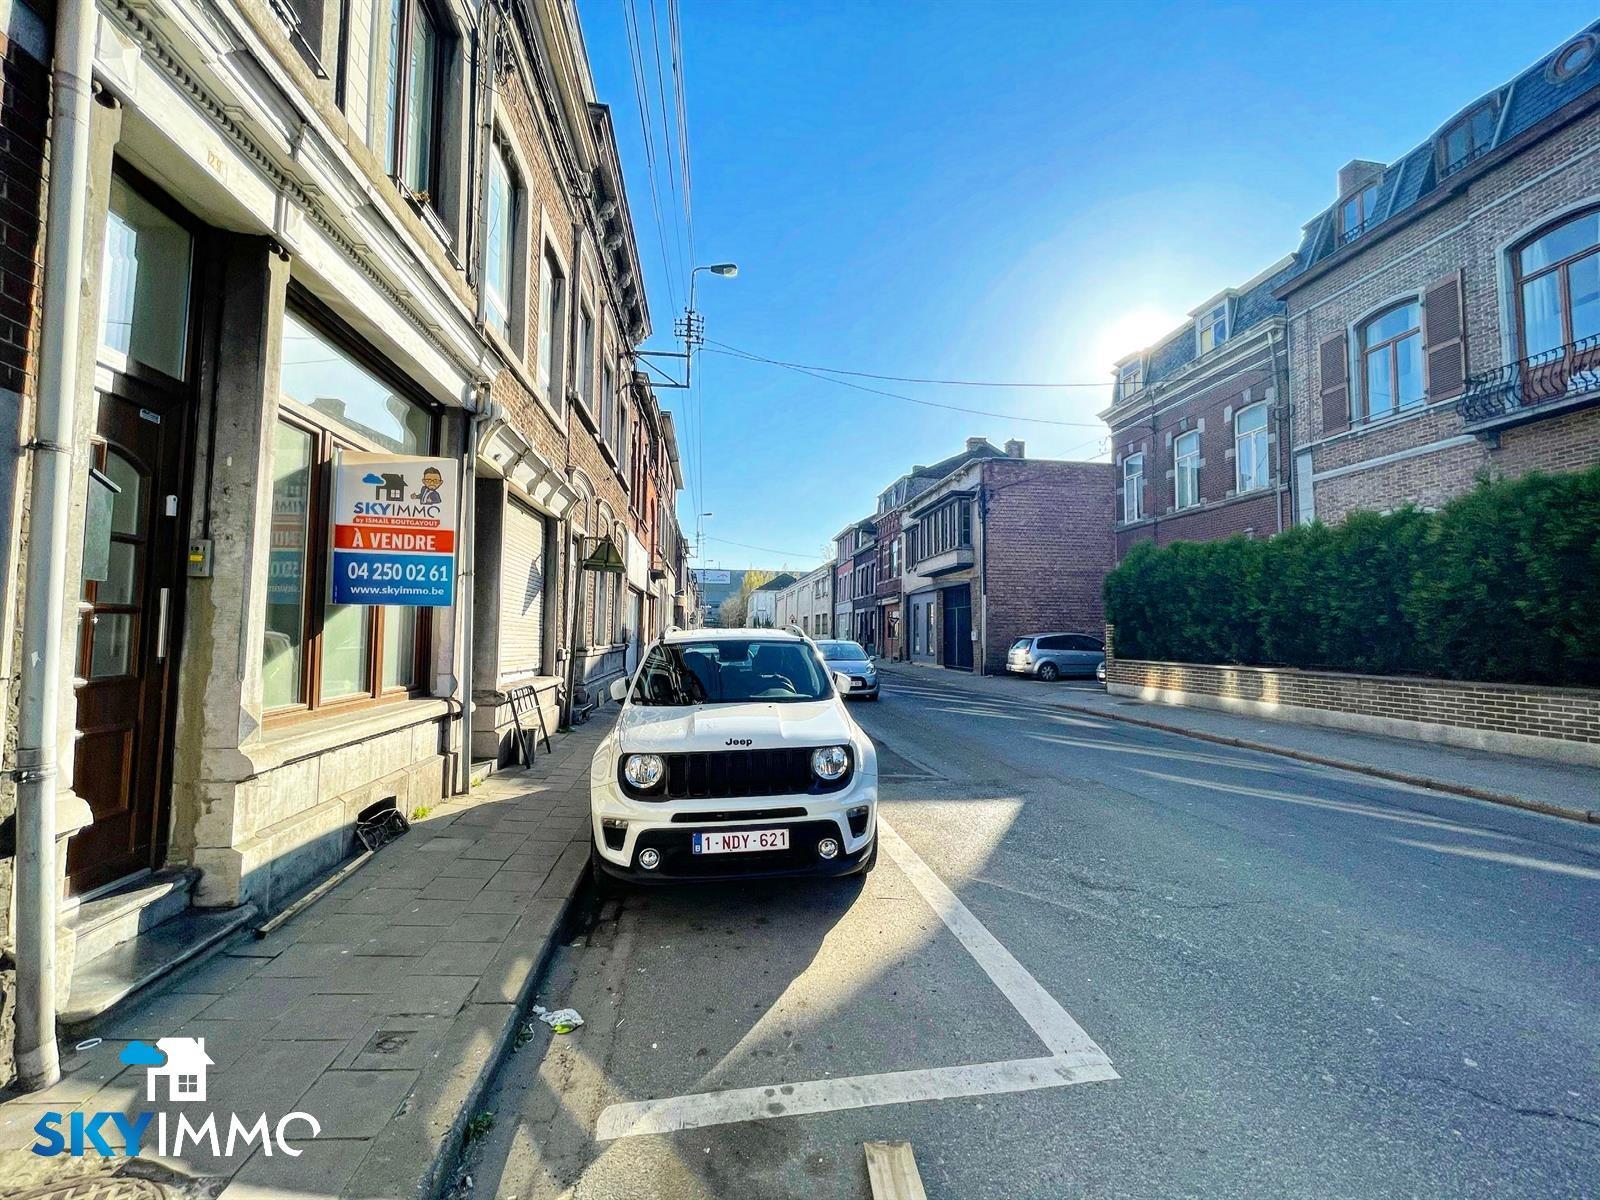 Maison - Seraing Jemeppesur-Meuse - #4343977-24